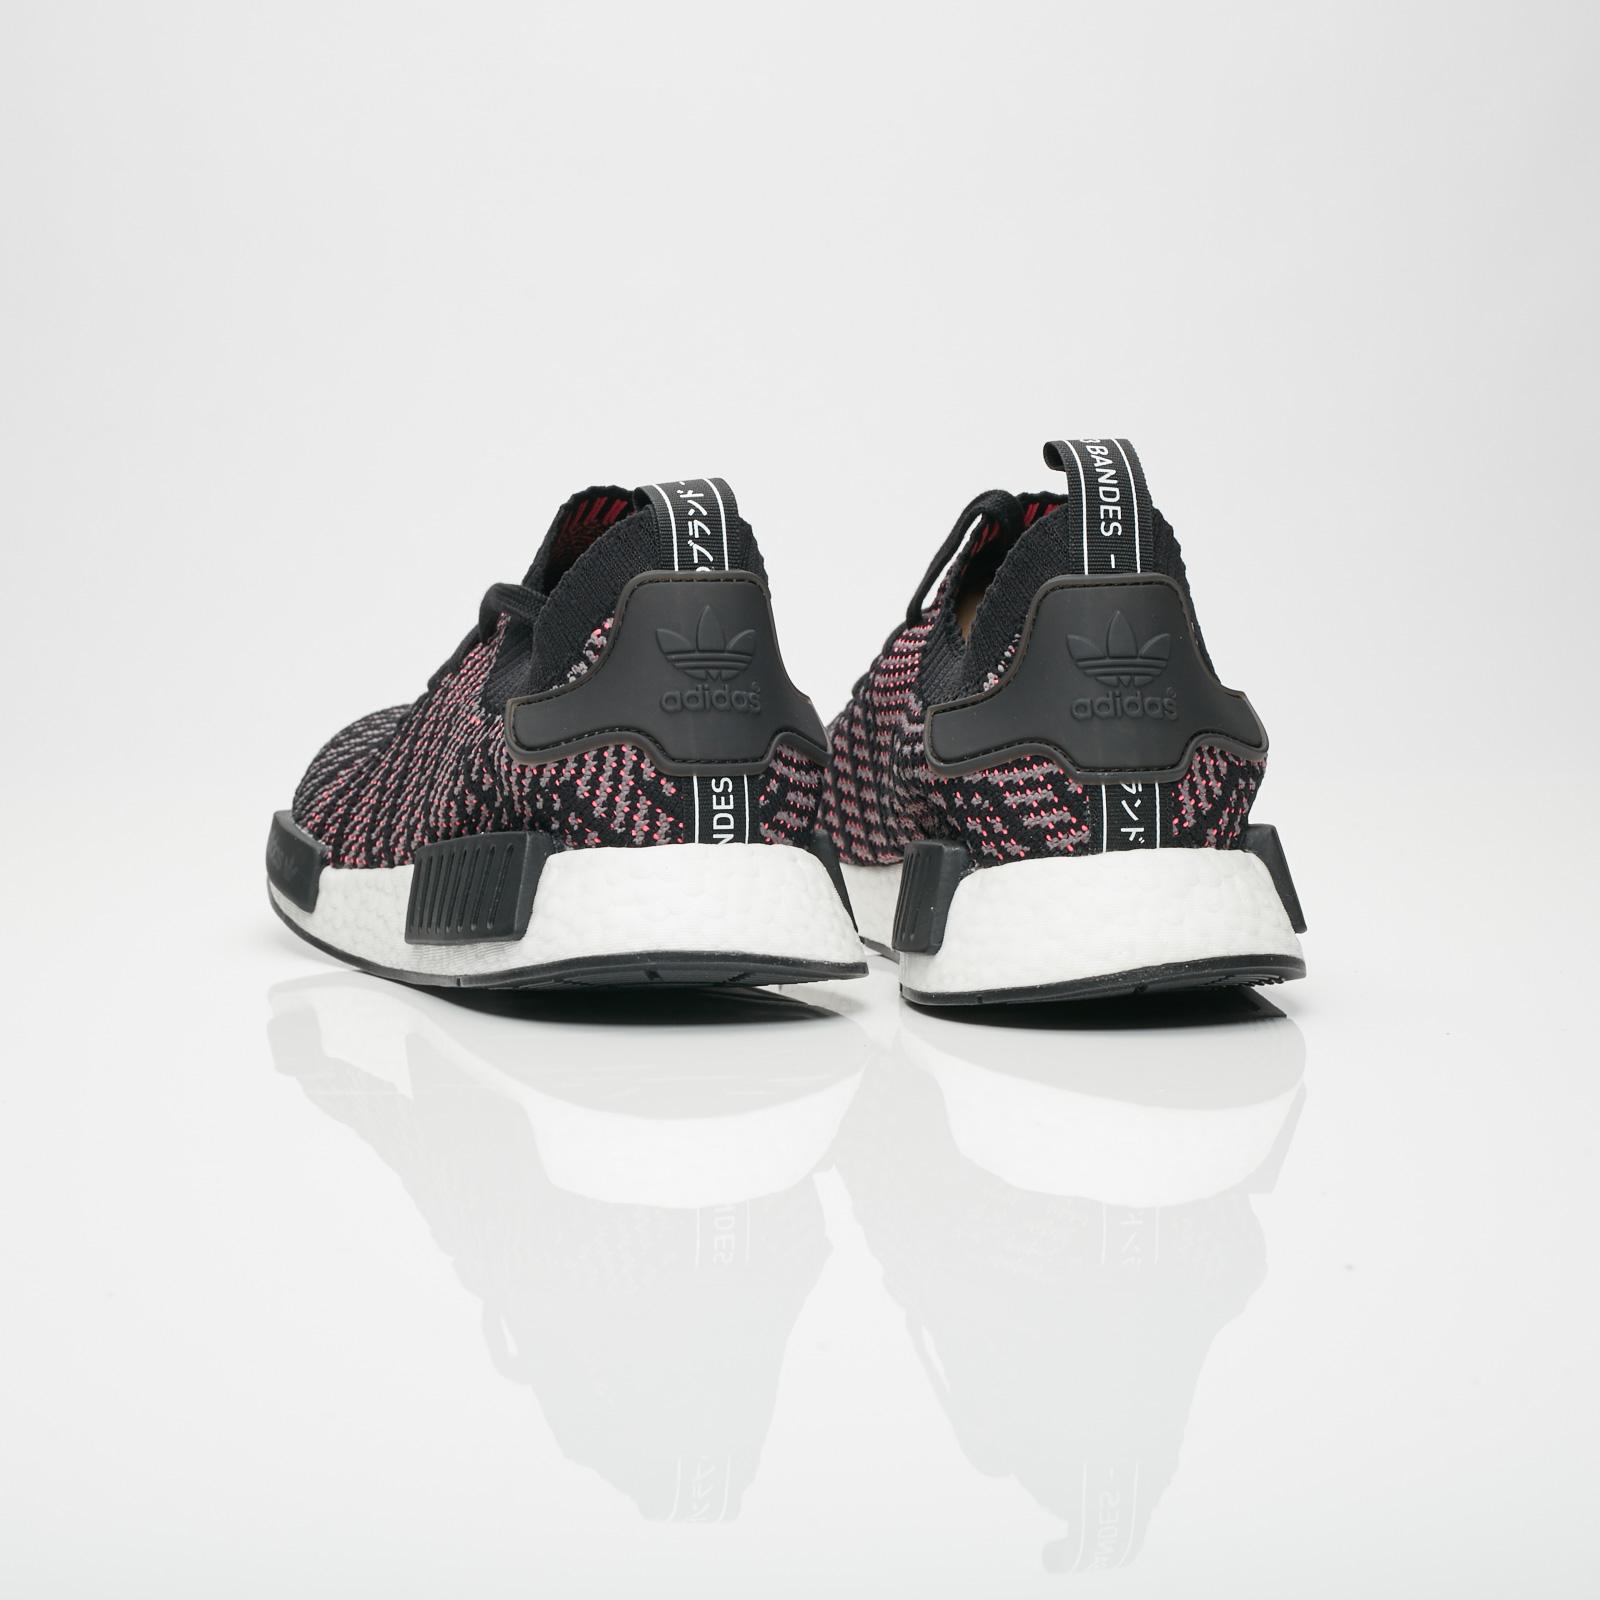 c4e9777210a adidas NMD R1 STLT Primeknit - Cq2386 - Sneakersnstuff I Sneakers ...